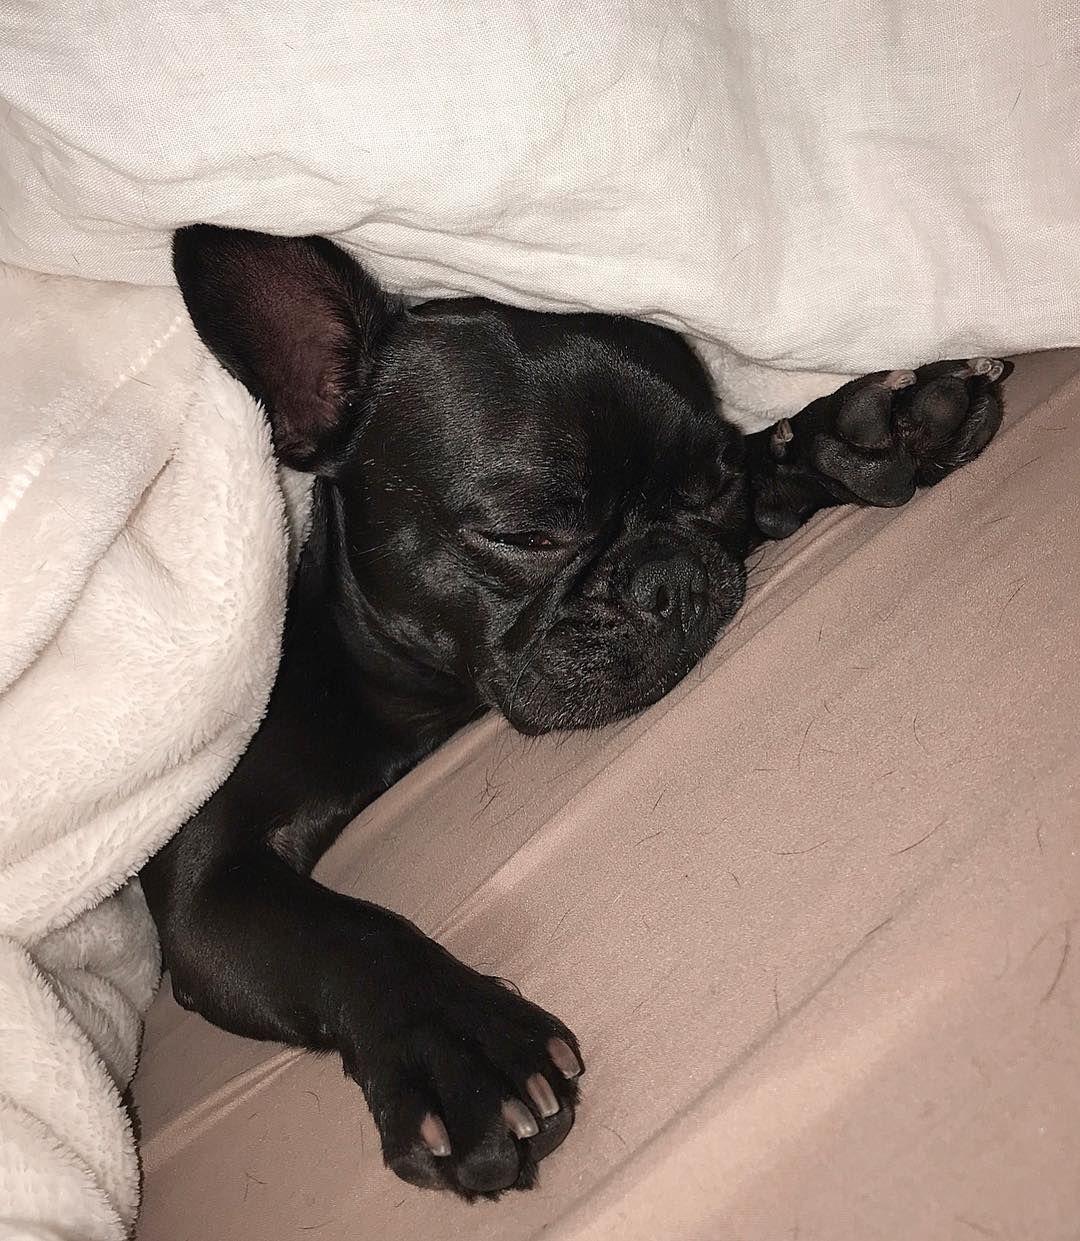 Pin By Darsel Keiller On Sleeping Dogs Sleeping Dogs Fur Friend